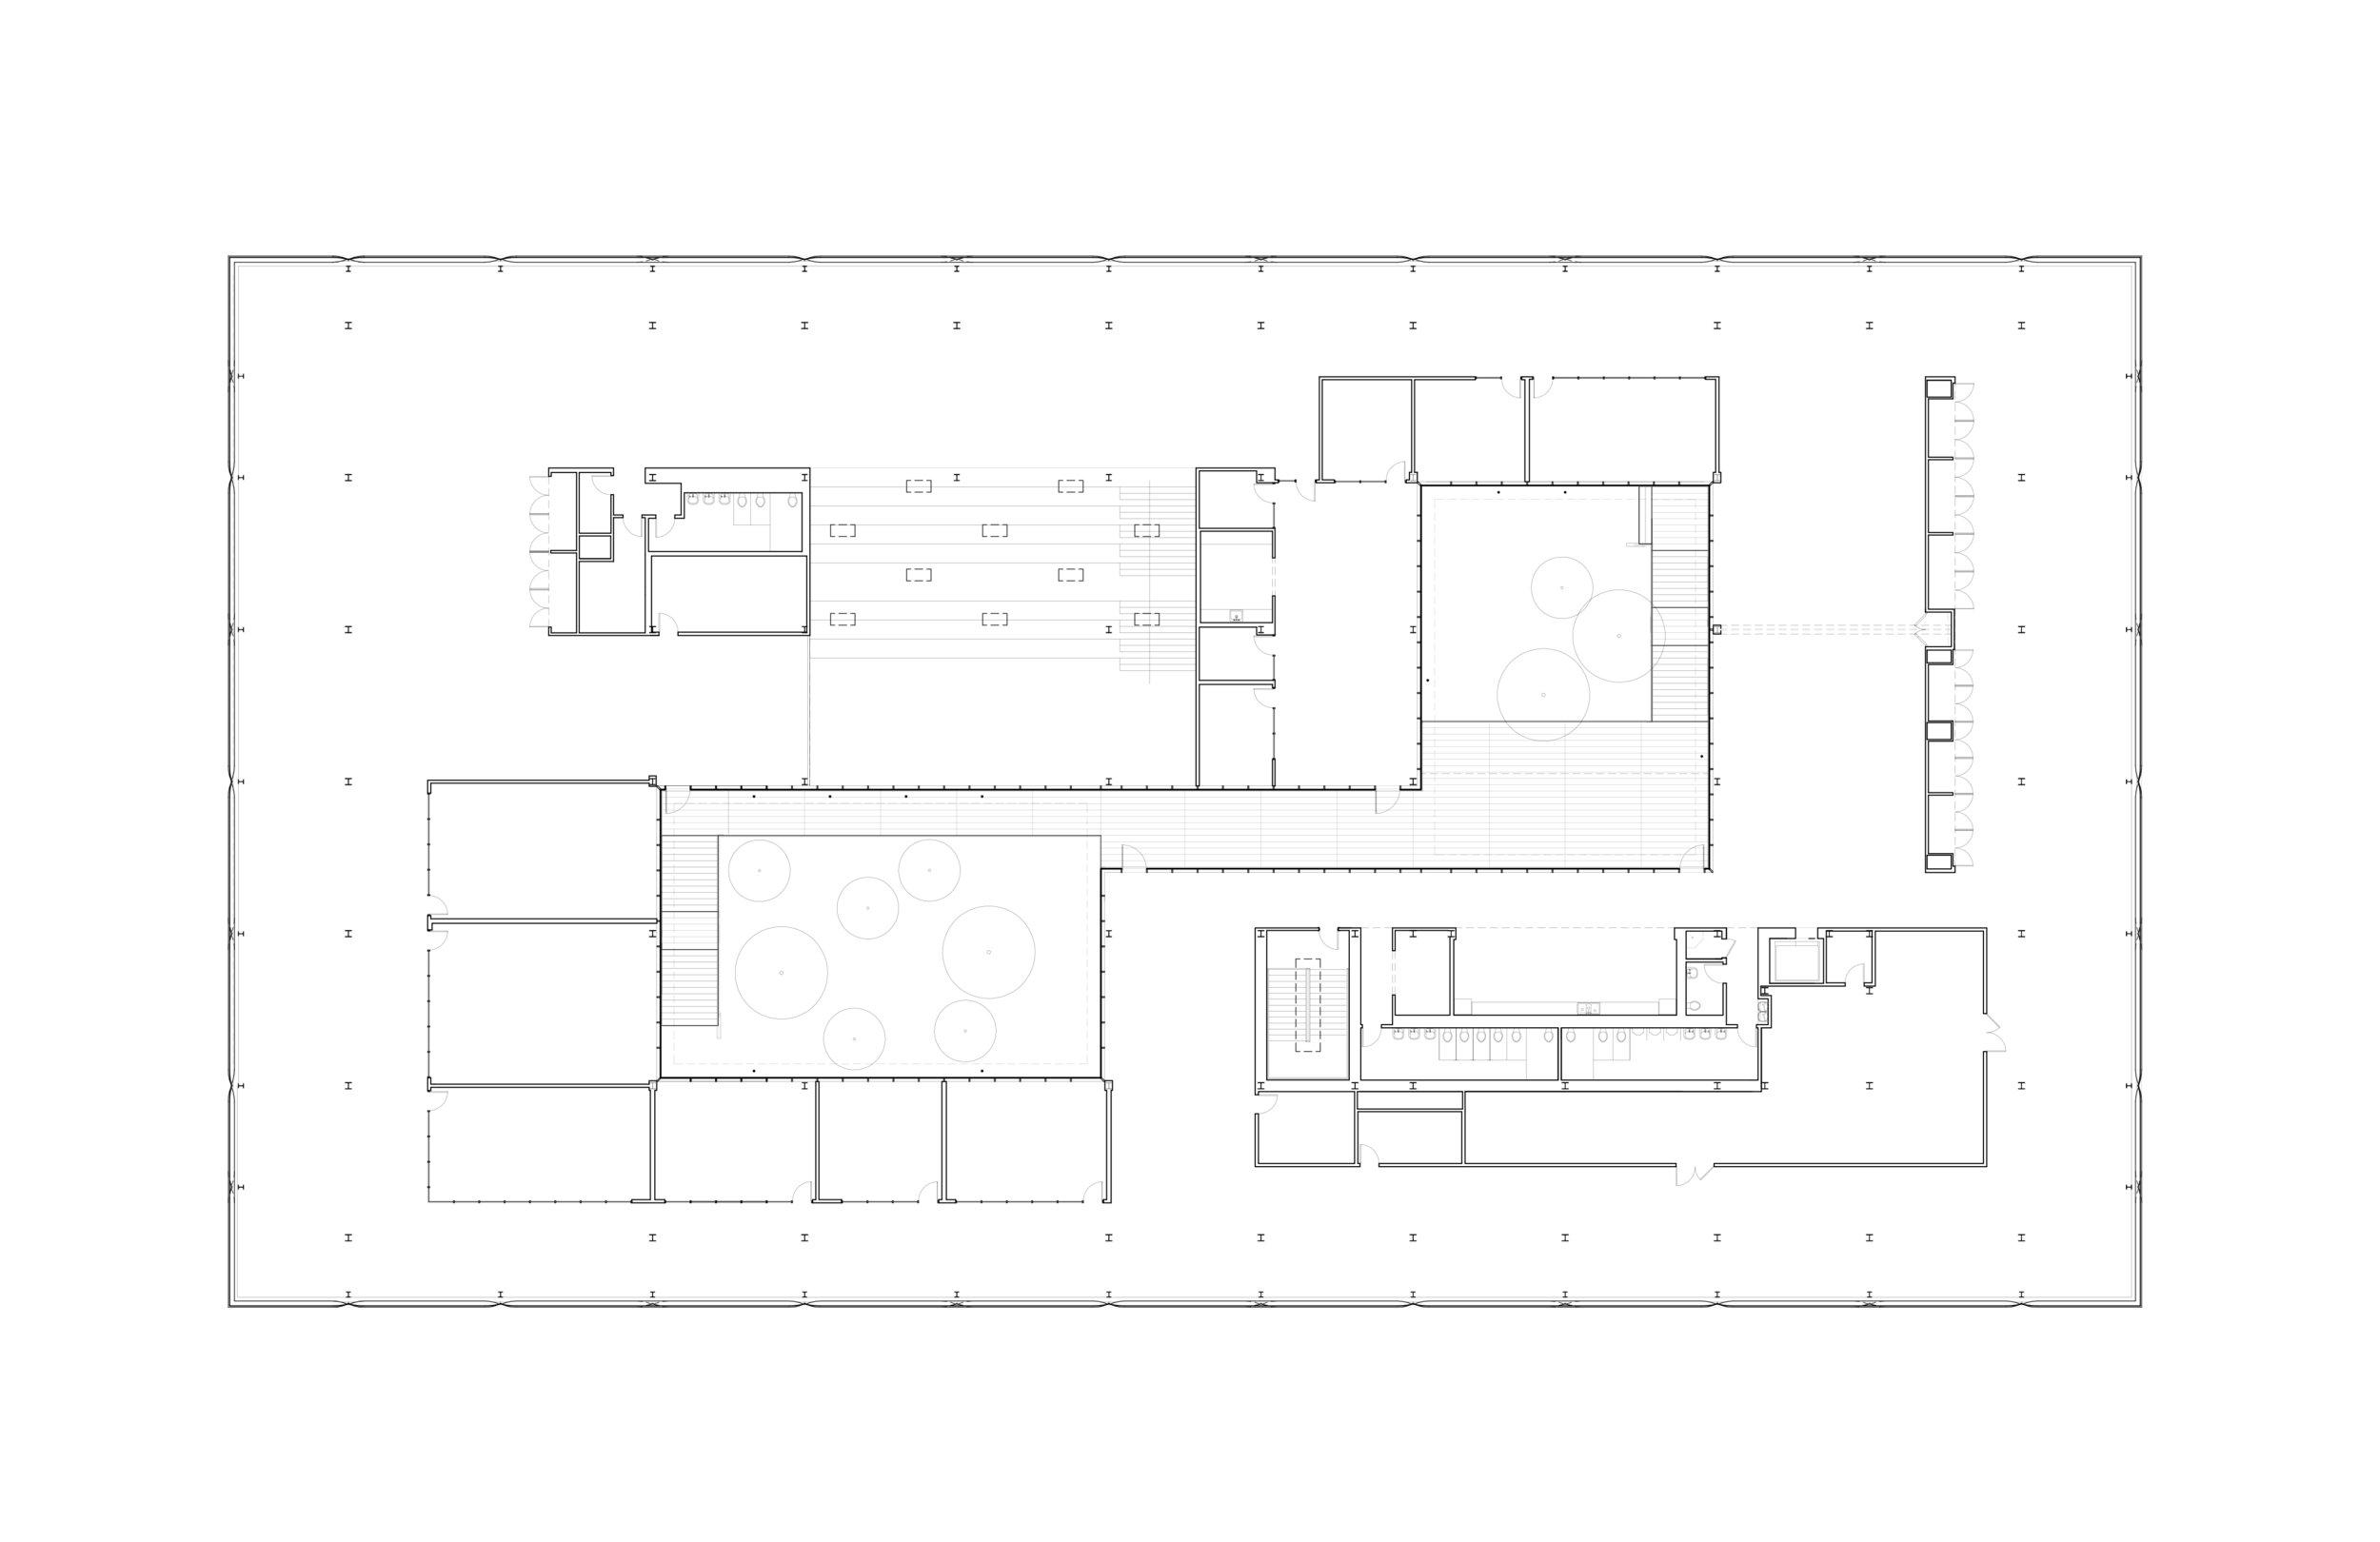 18_09.18 - IITIC - upper level plan.jpg